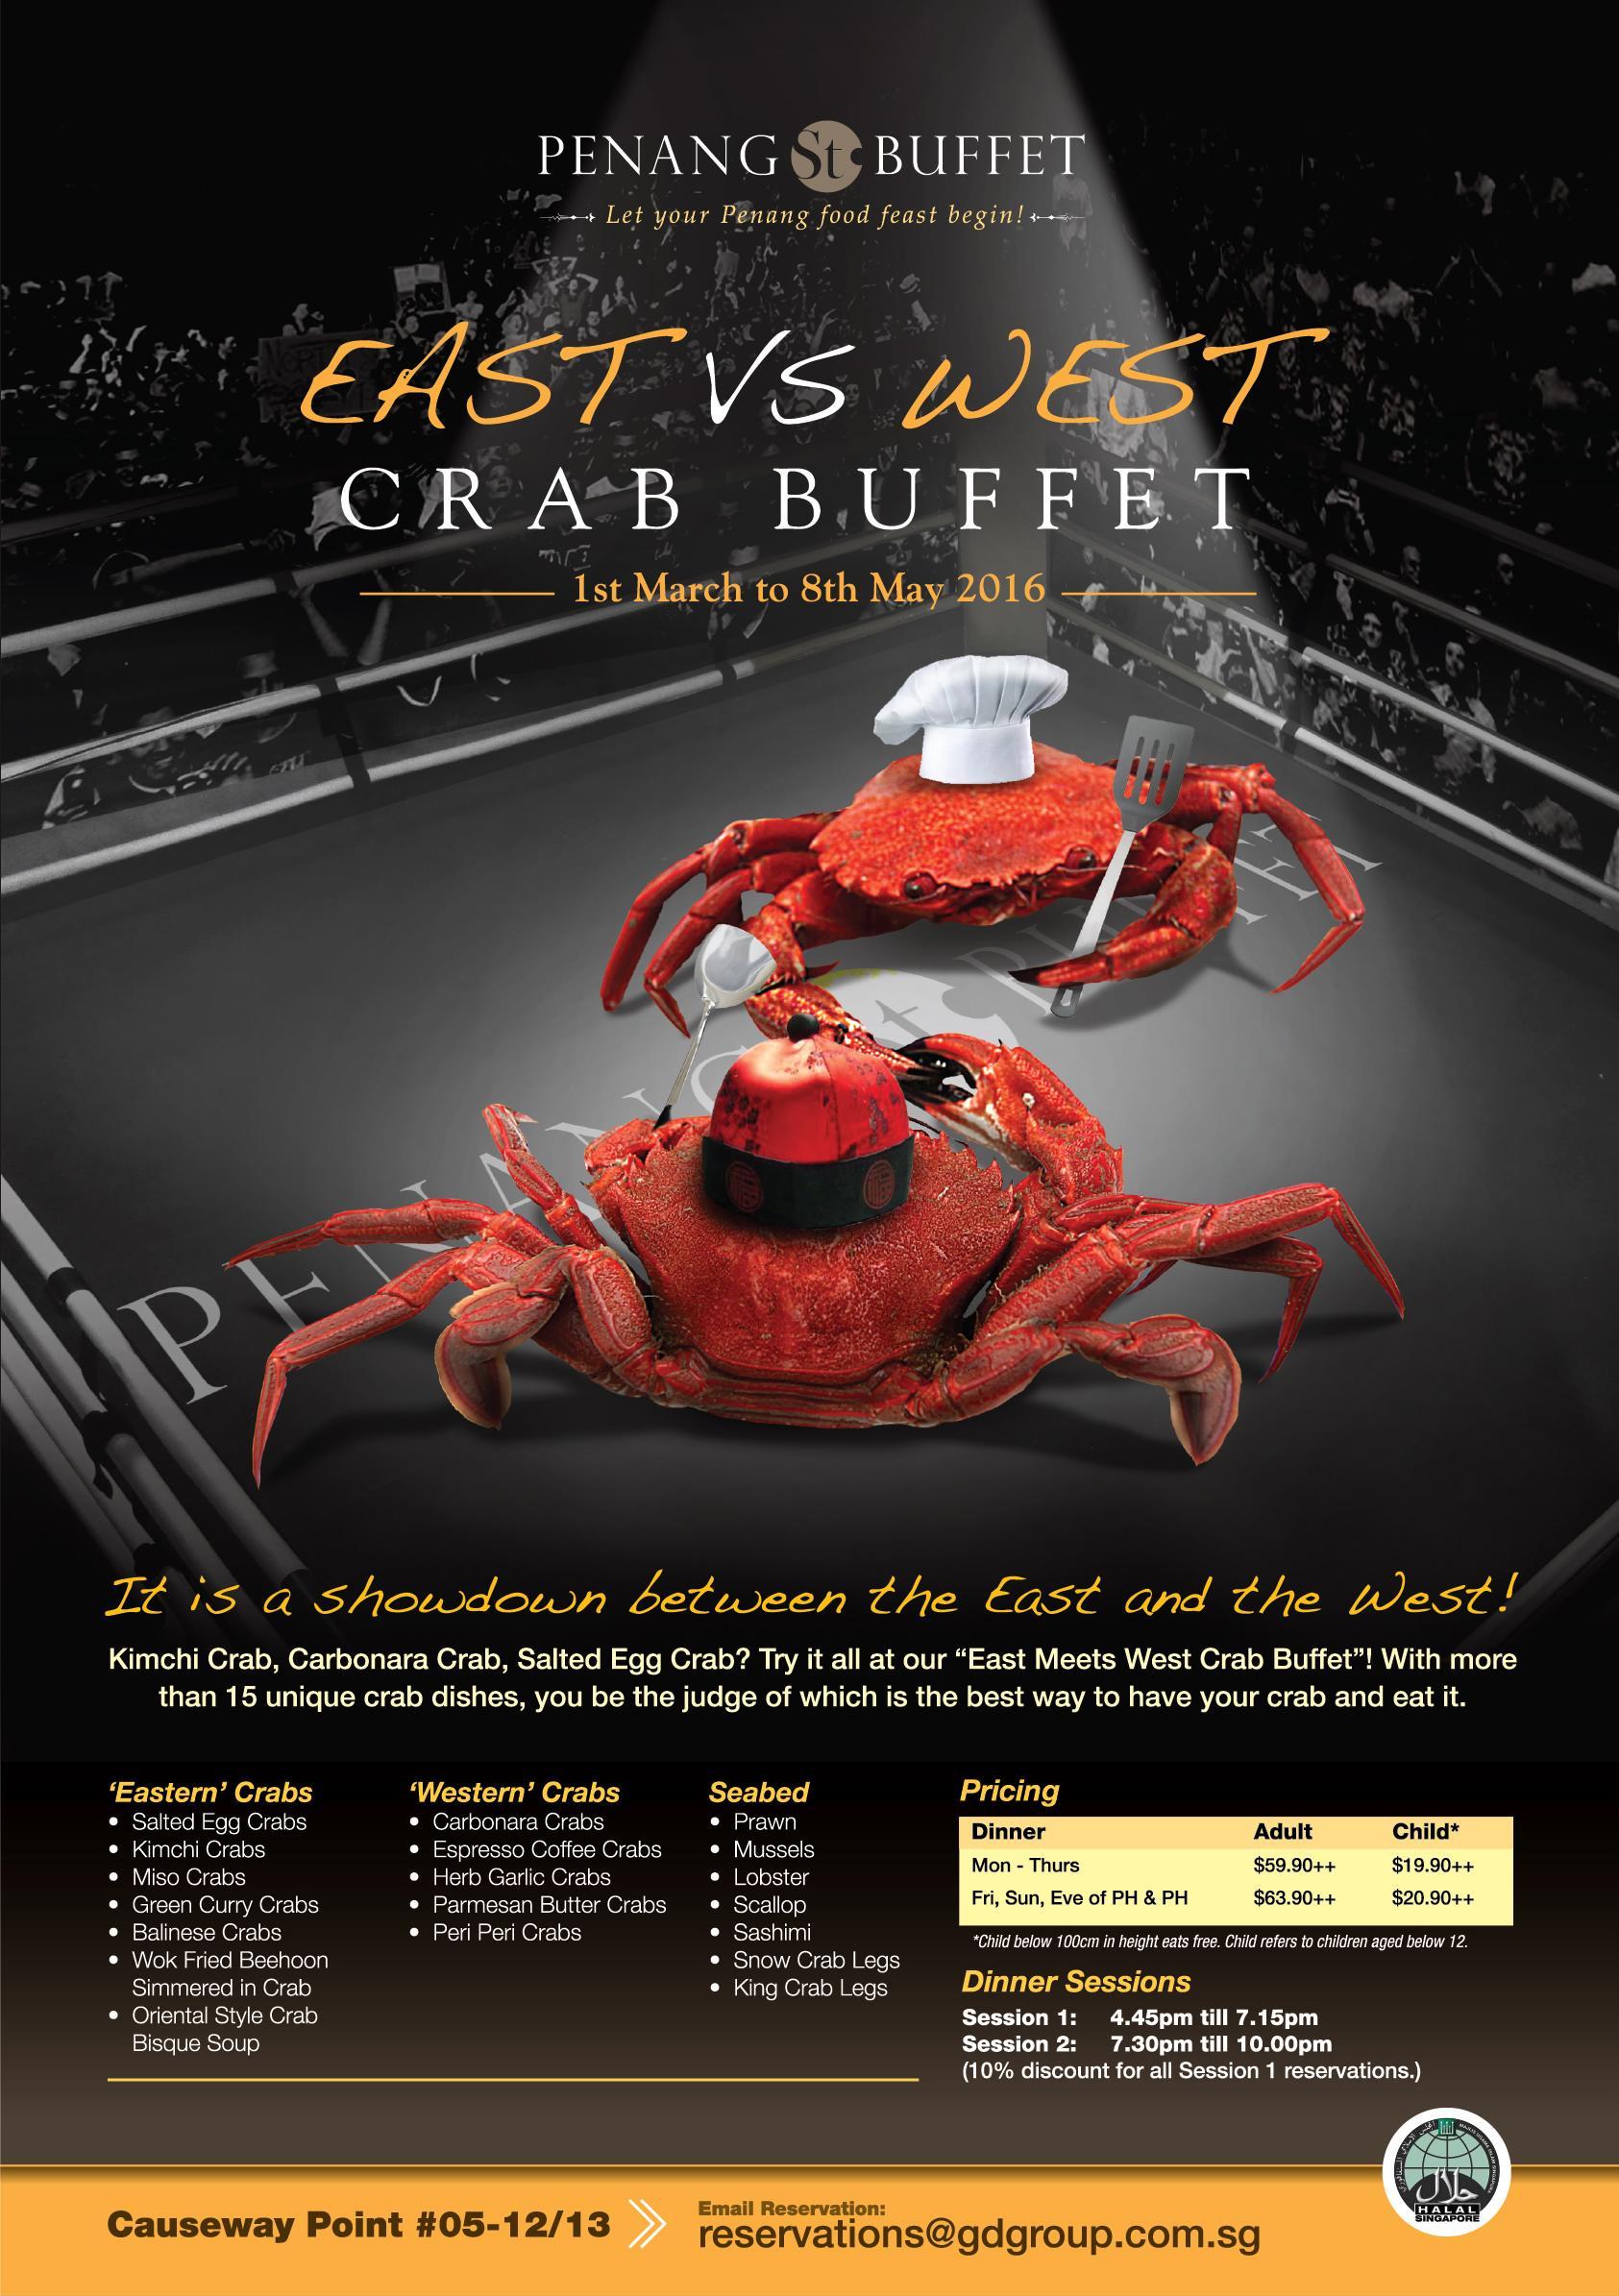 Penang St Bufet East vs West Crab Buffet